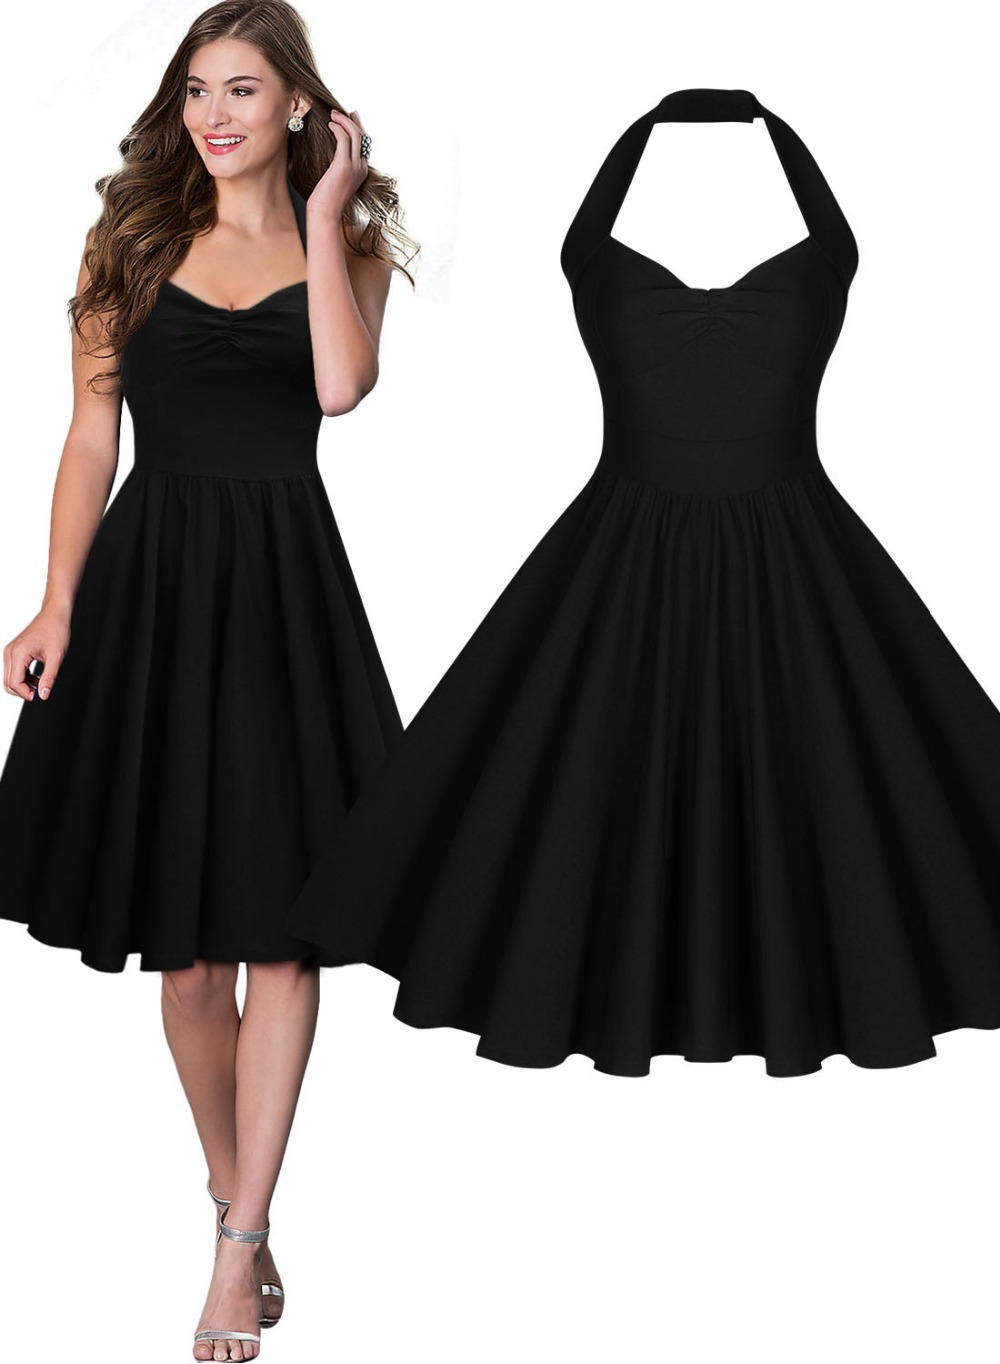 Popular Womens Dress Styles 1950s